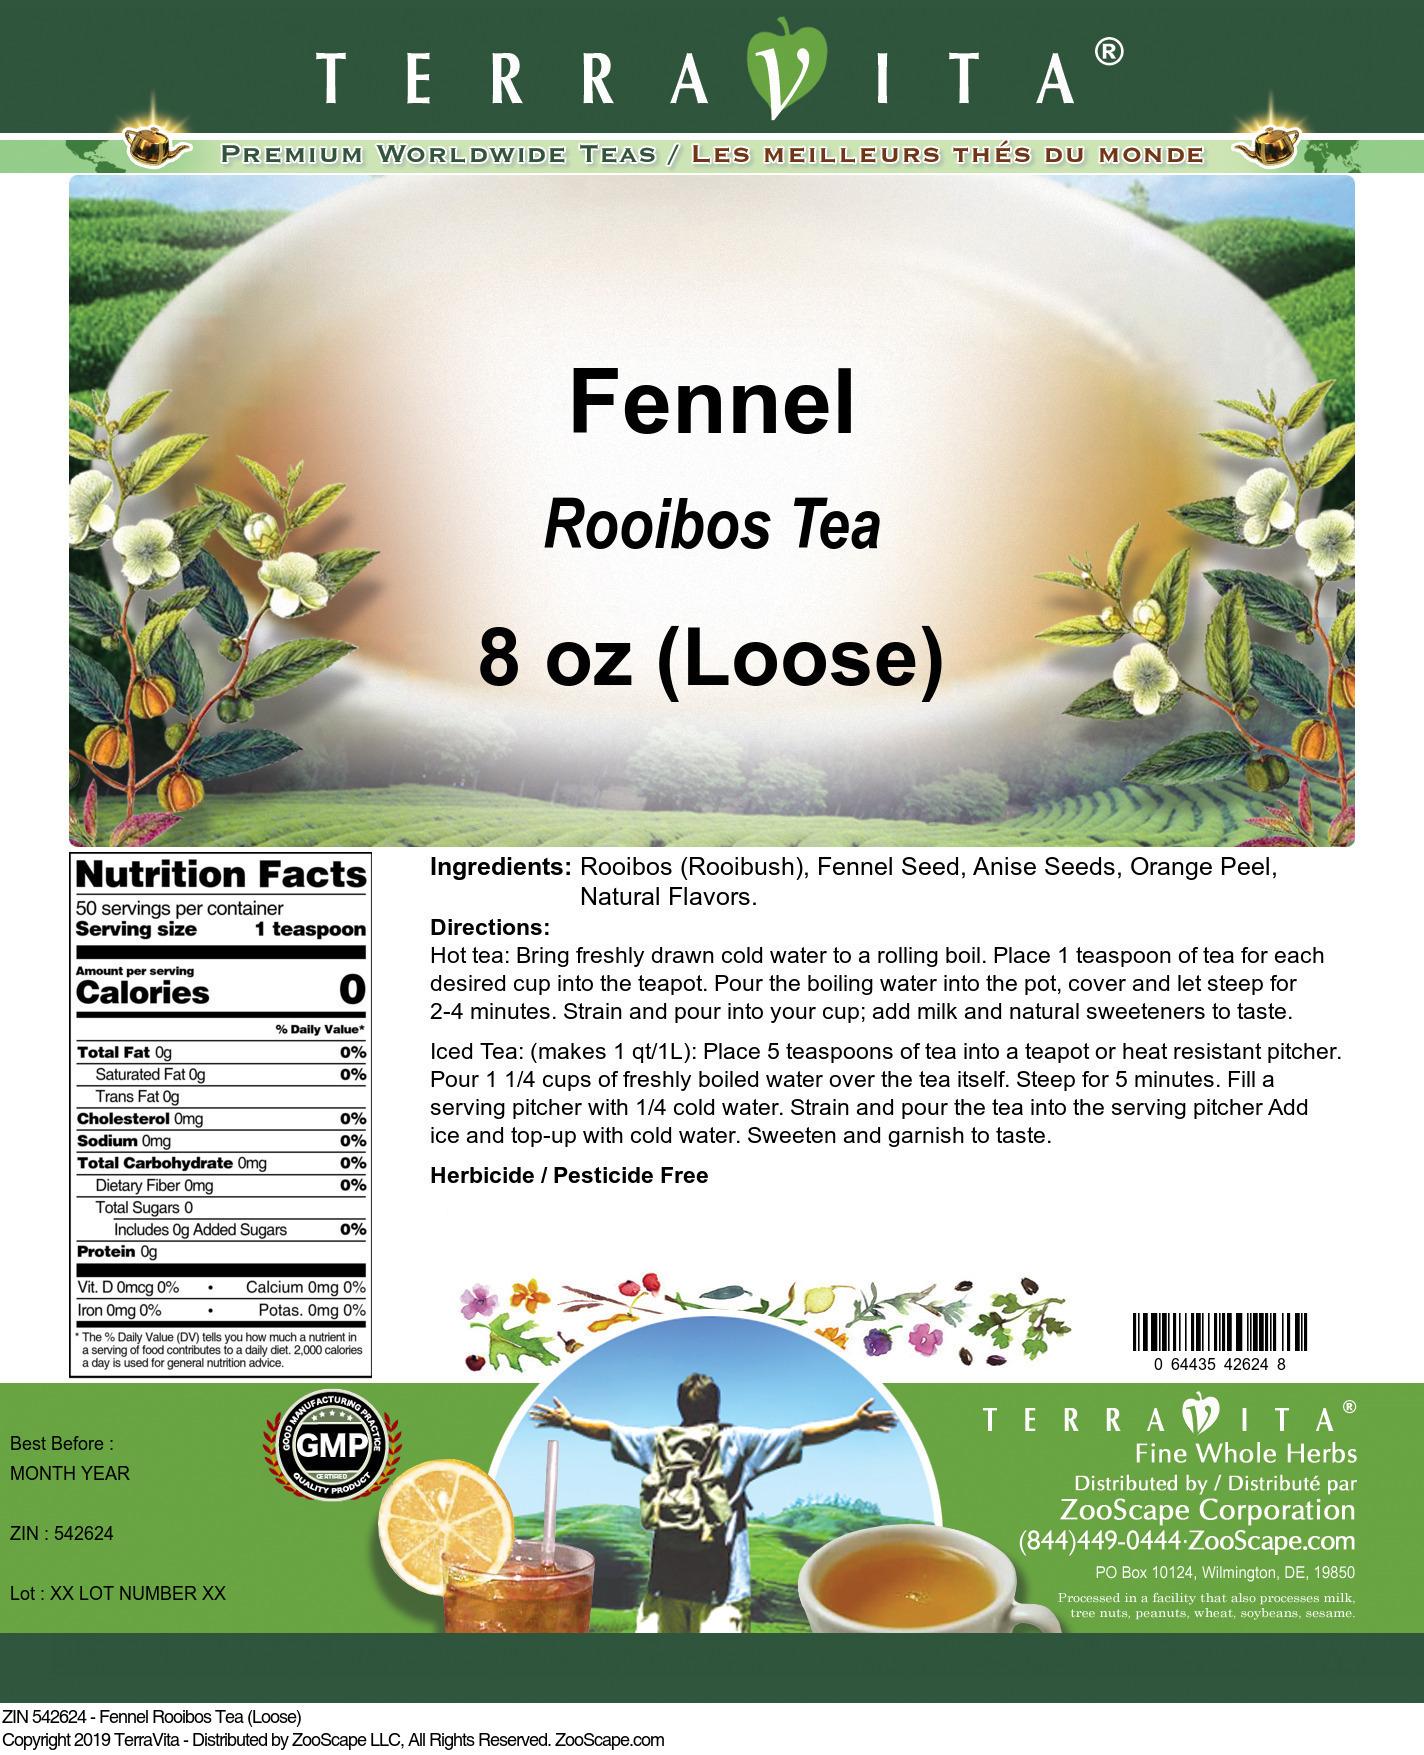 Fennel Rooibos Tea